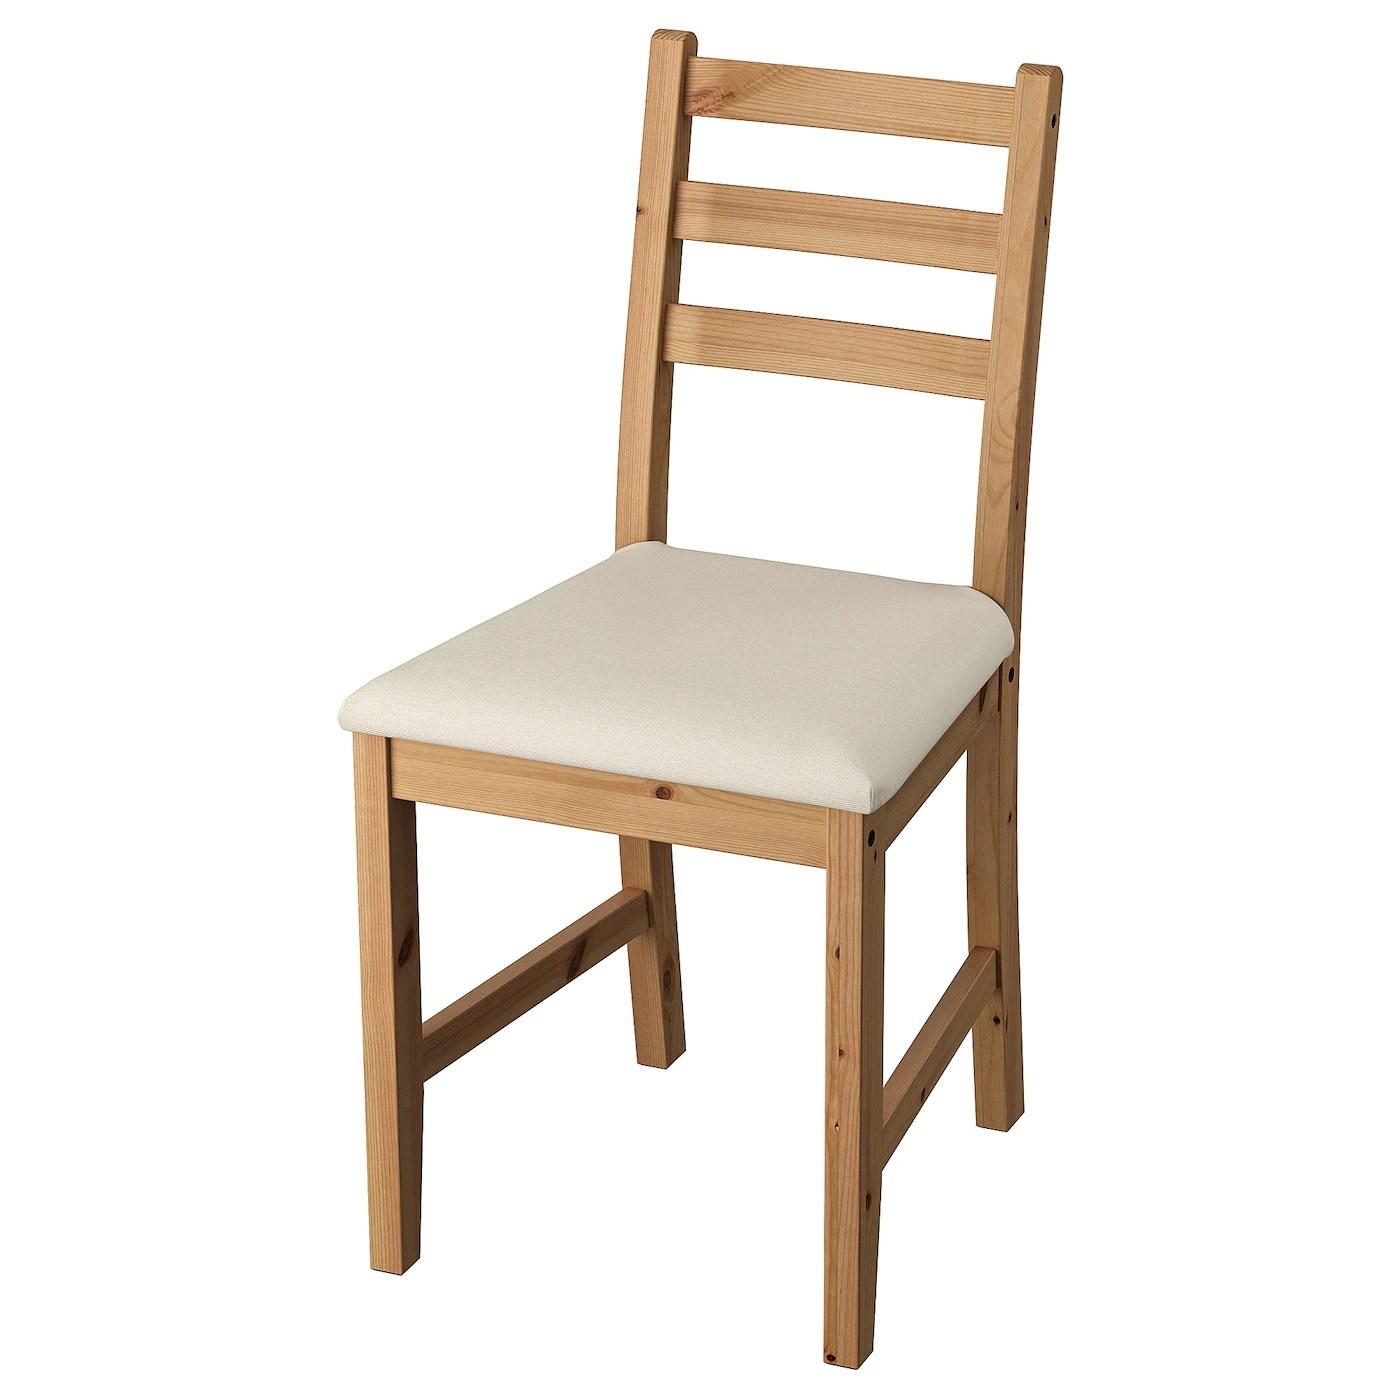 Catalogo ikea sedie per bambini. Sedie Sala Da Pranzo Ikea It